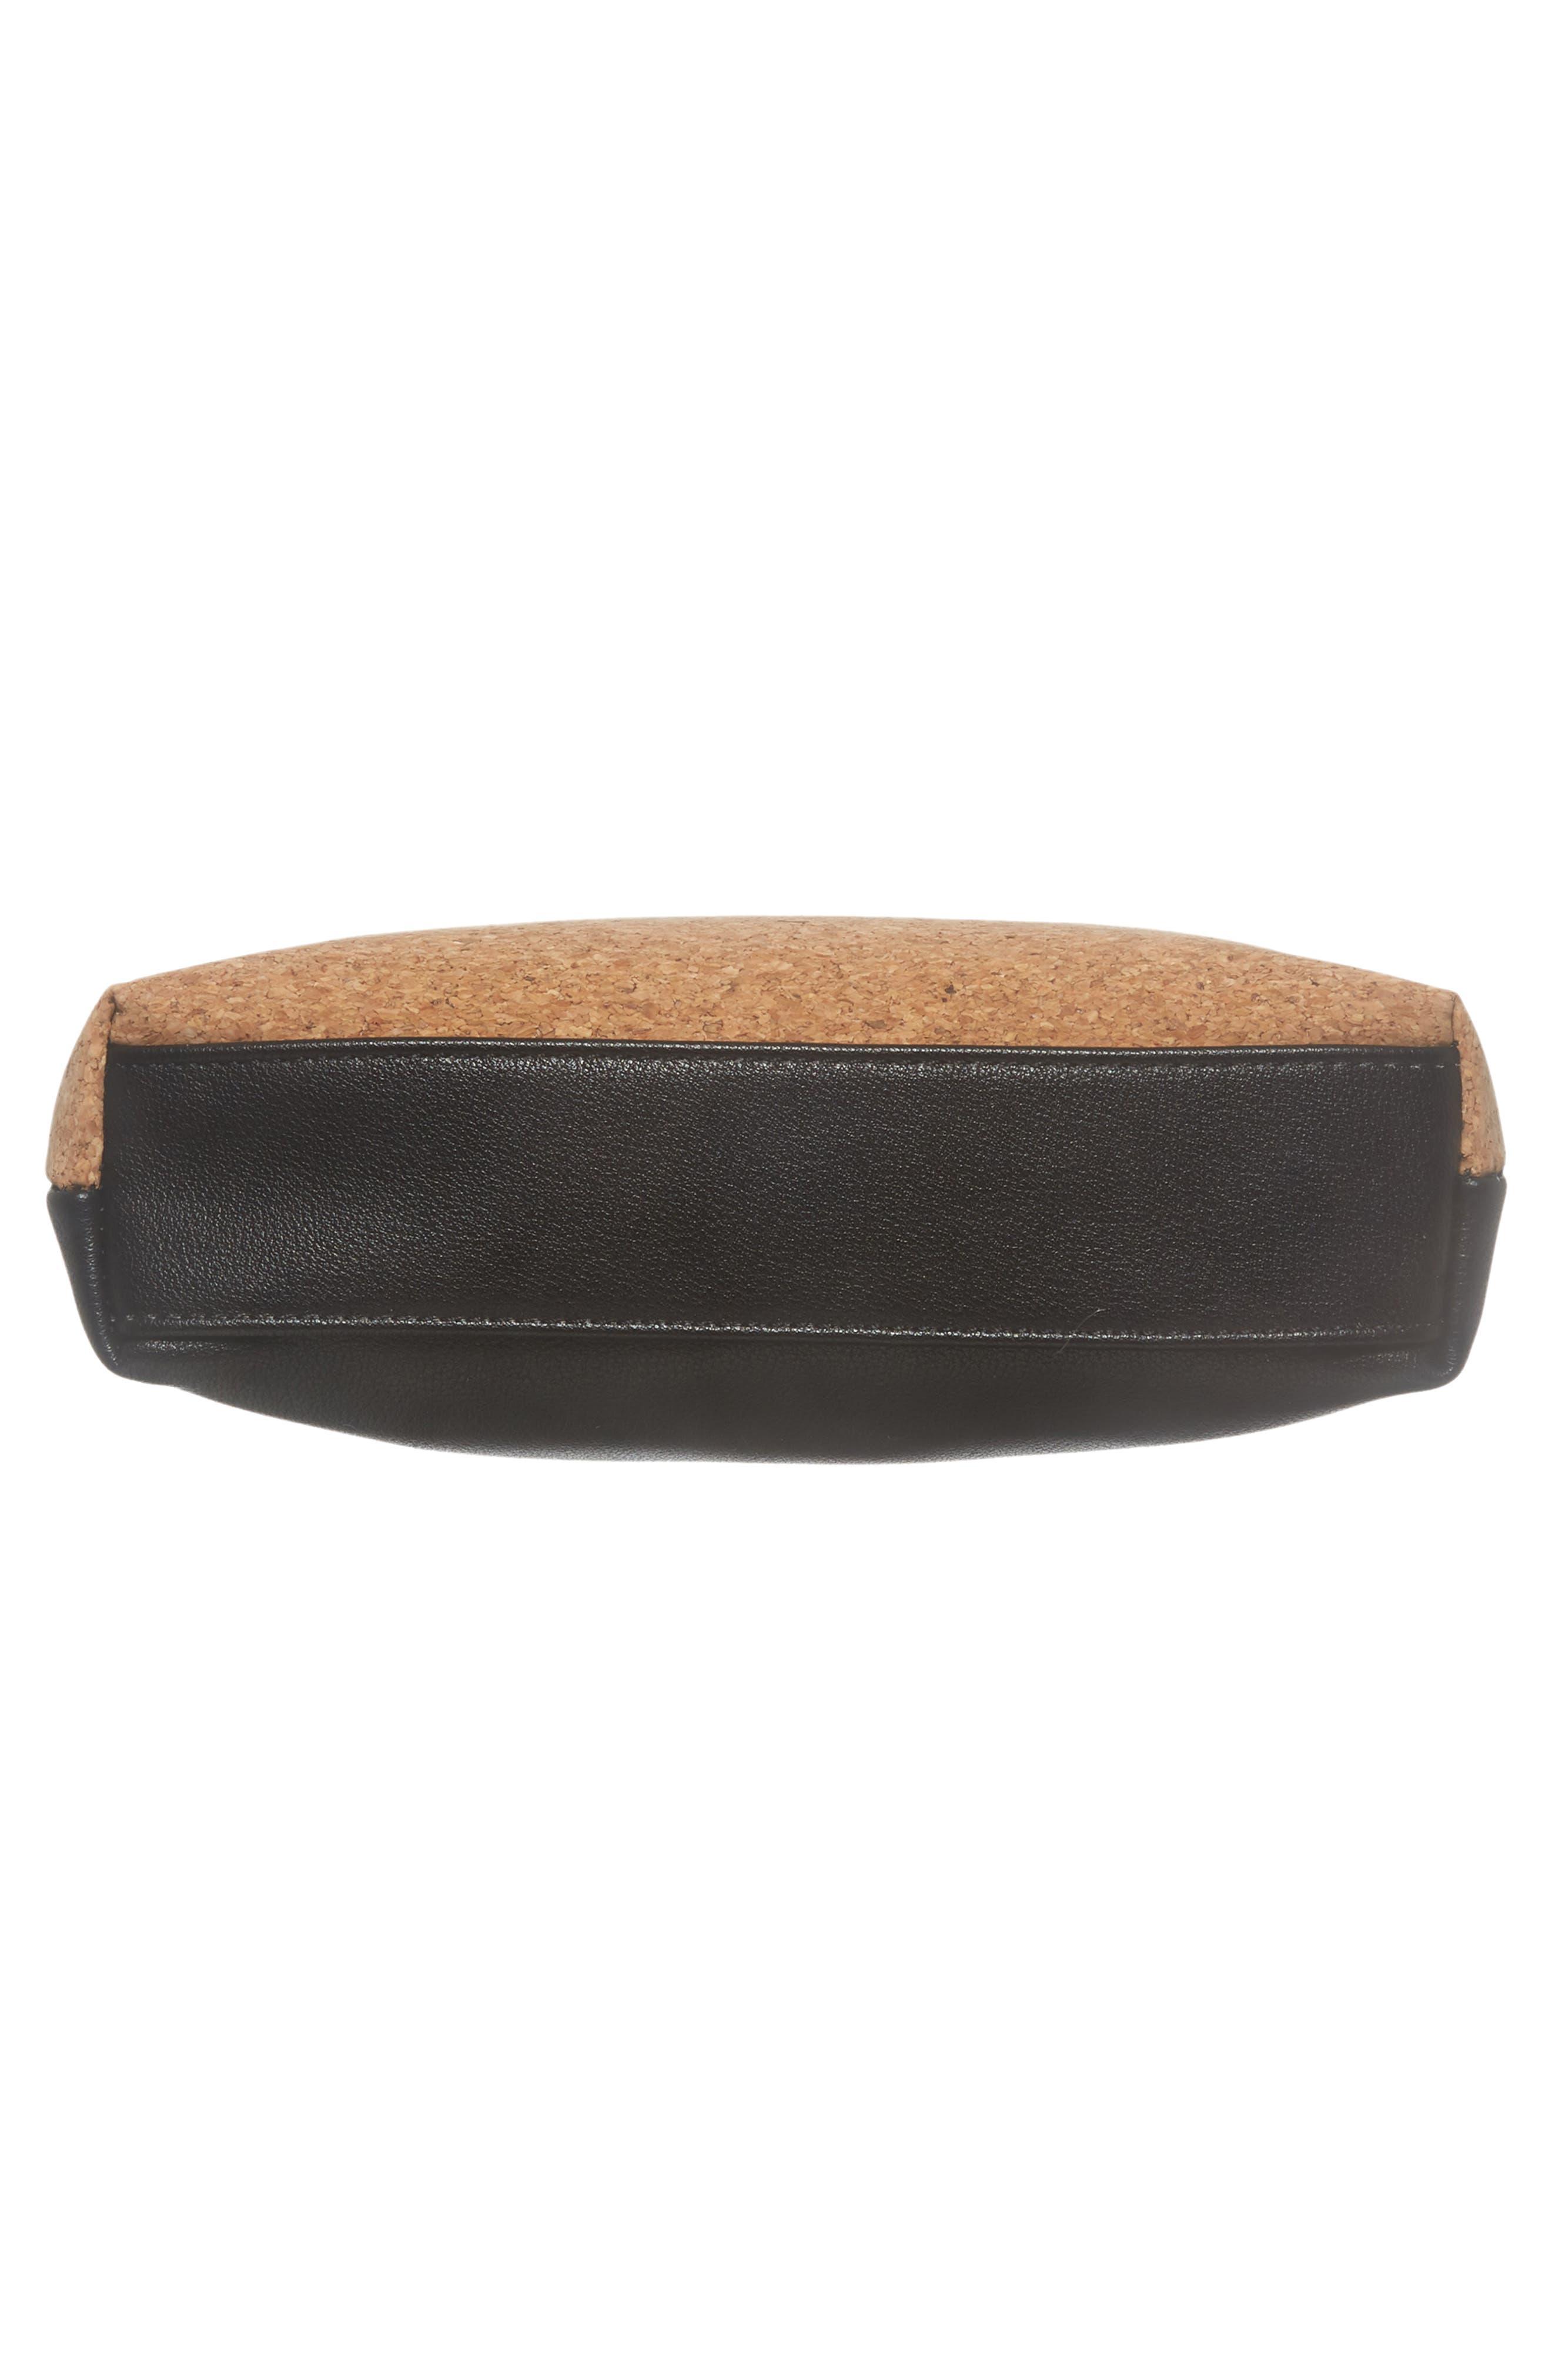 Claudia Faux Leather Crossbody Bag,                             Alternate thumbnail 5, color,                             Black